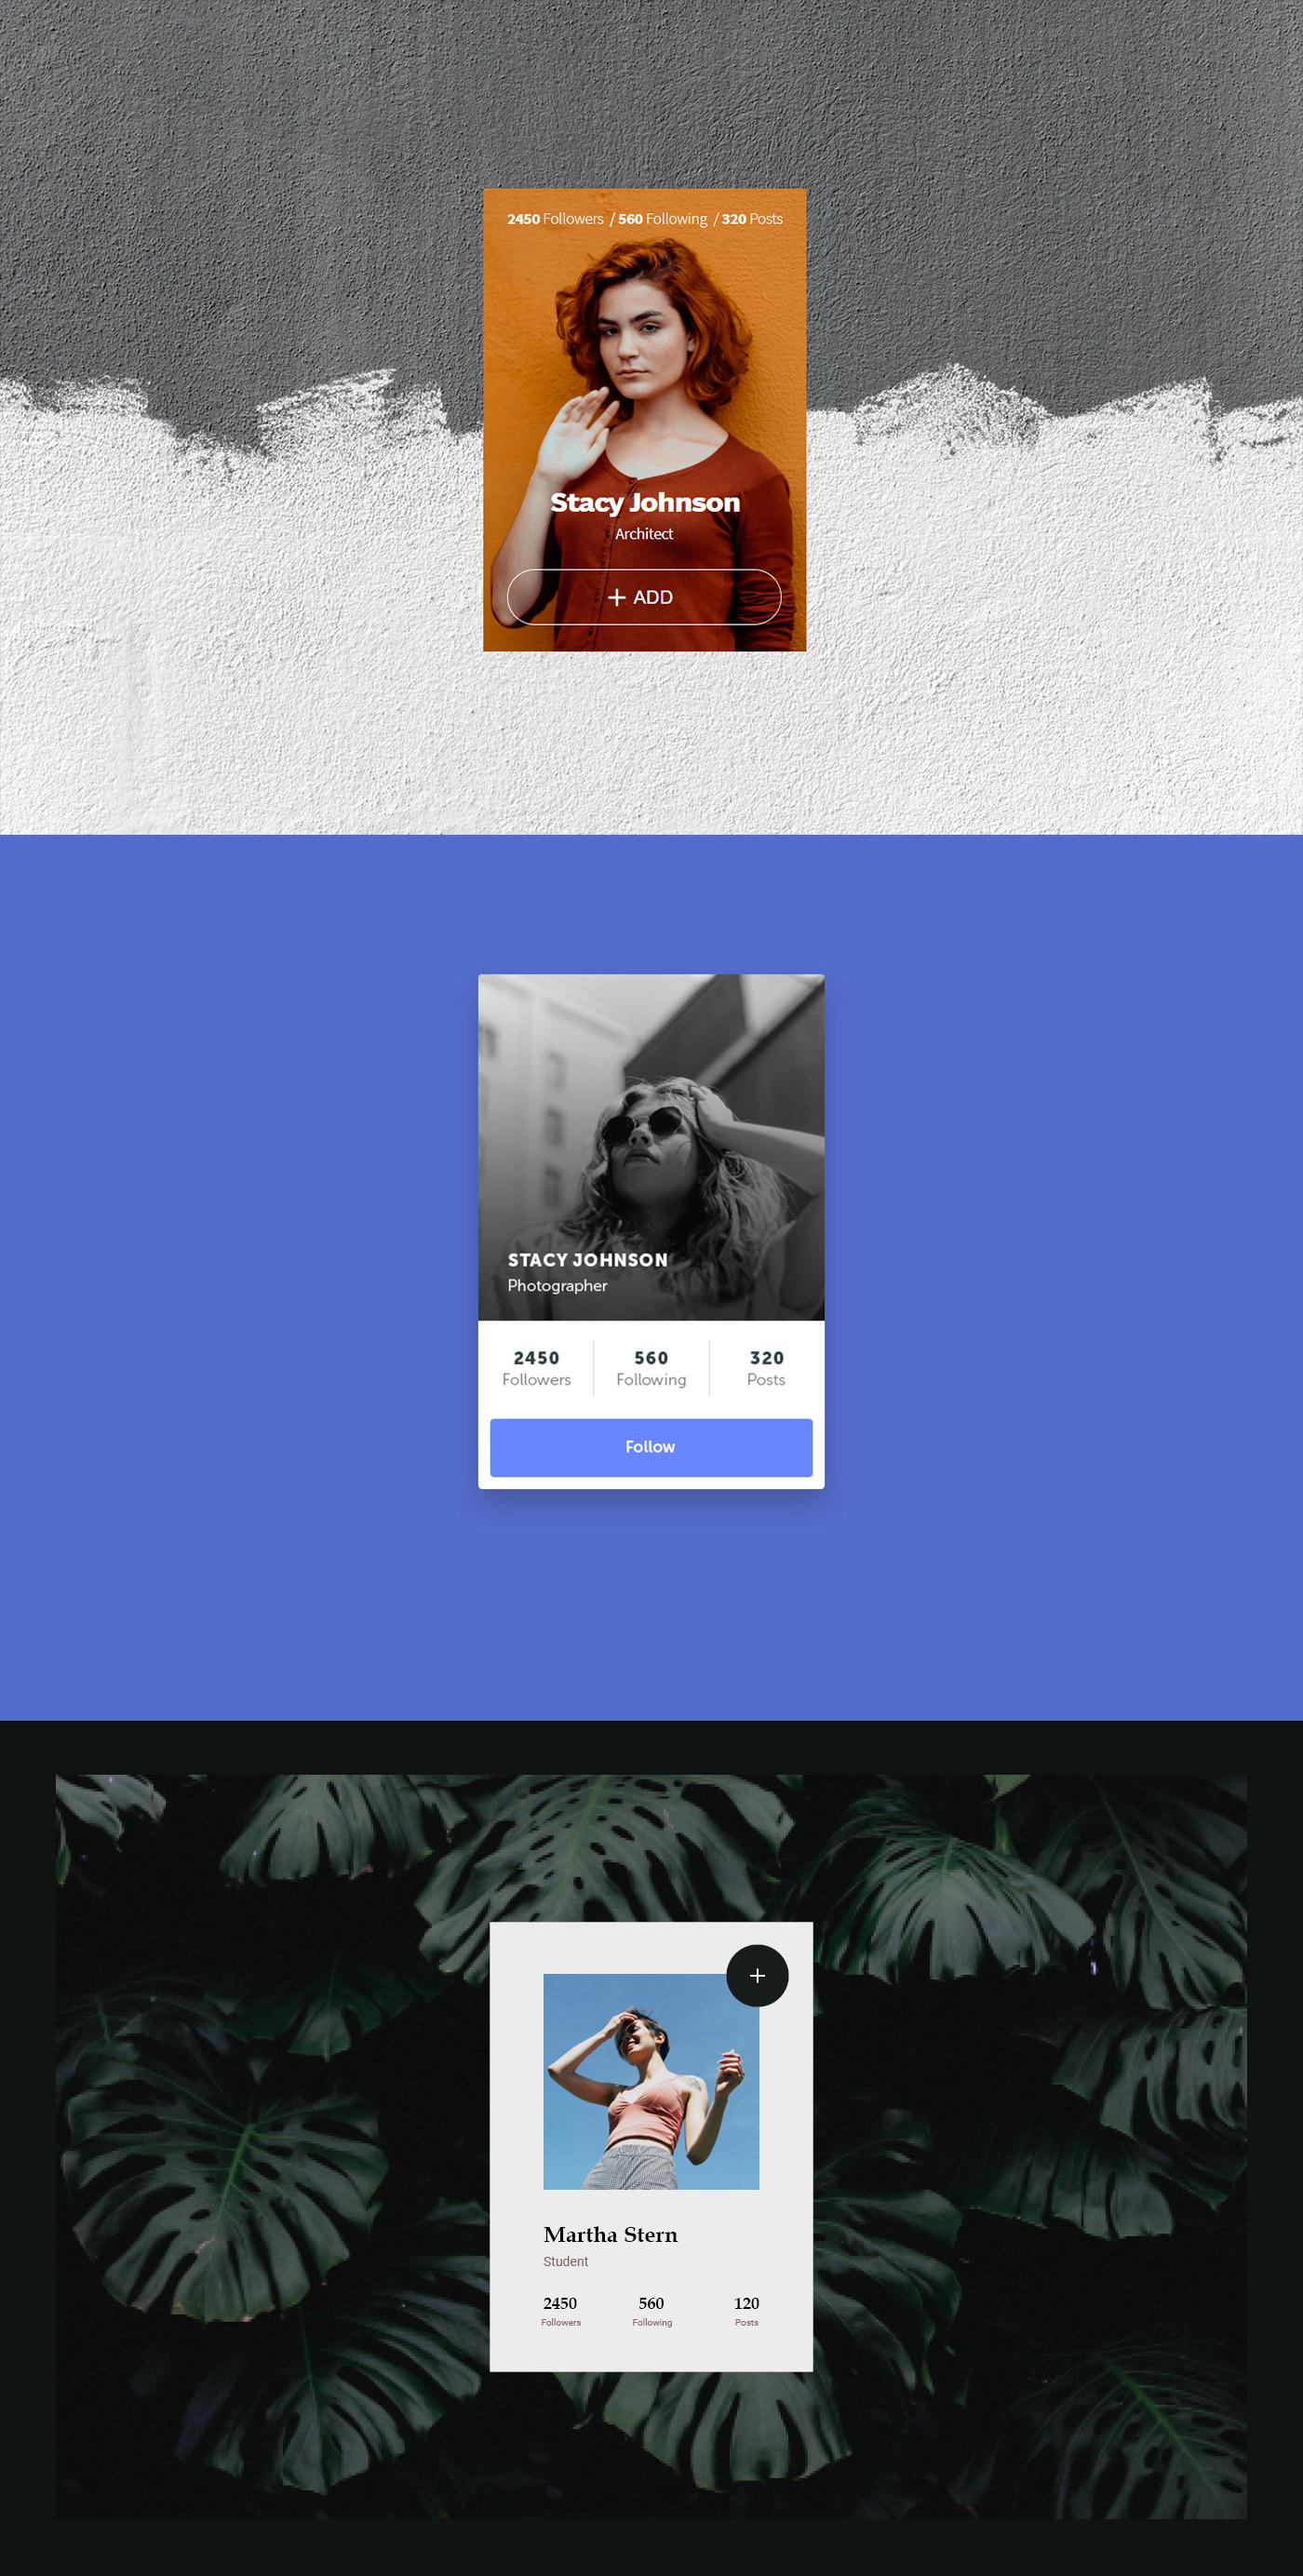 profile_card profile user_card user web_design Web Interface user_interface